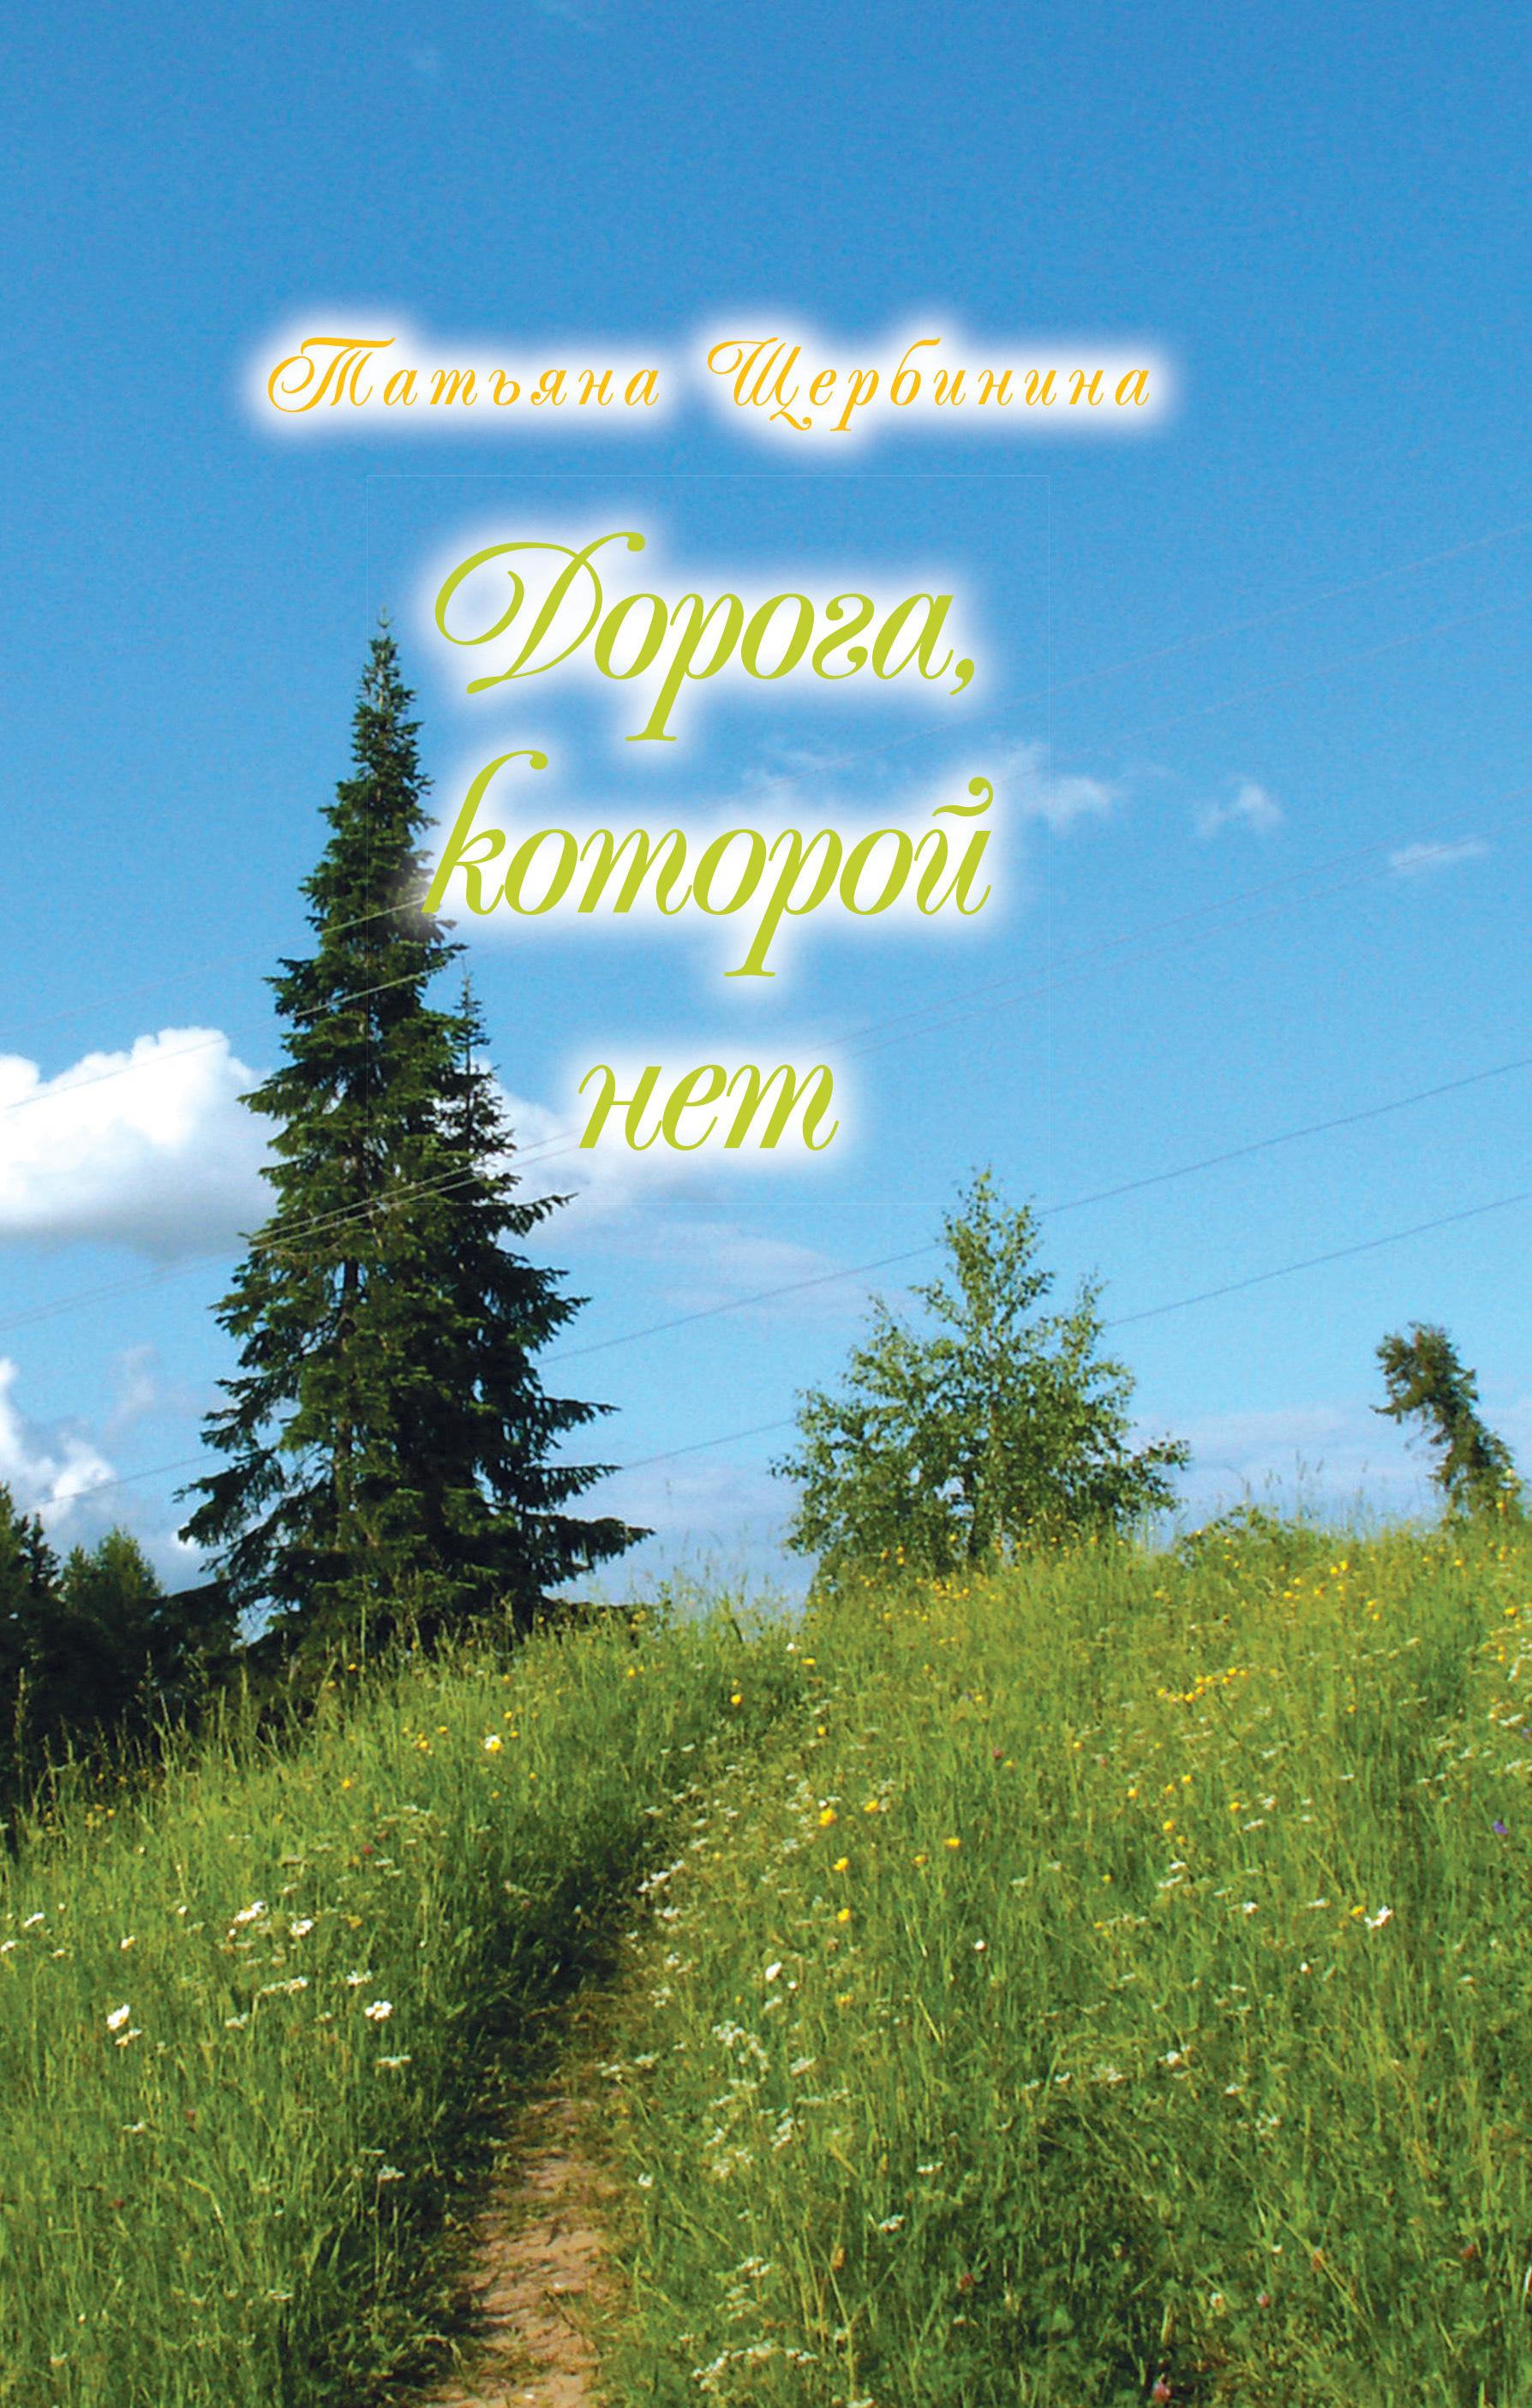 Татьяна Щербинина Дорога, которой нет щербинина татьяна юрьевна дорога которой нет